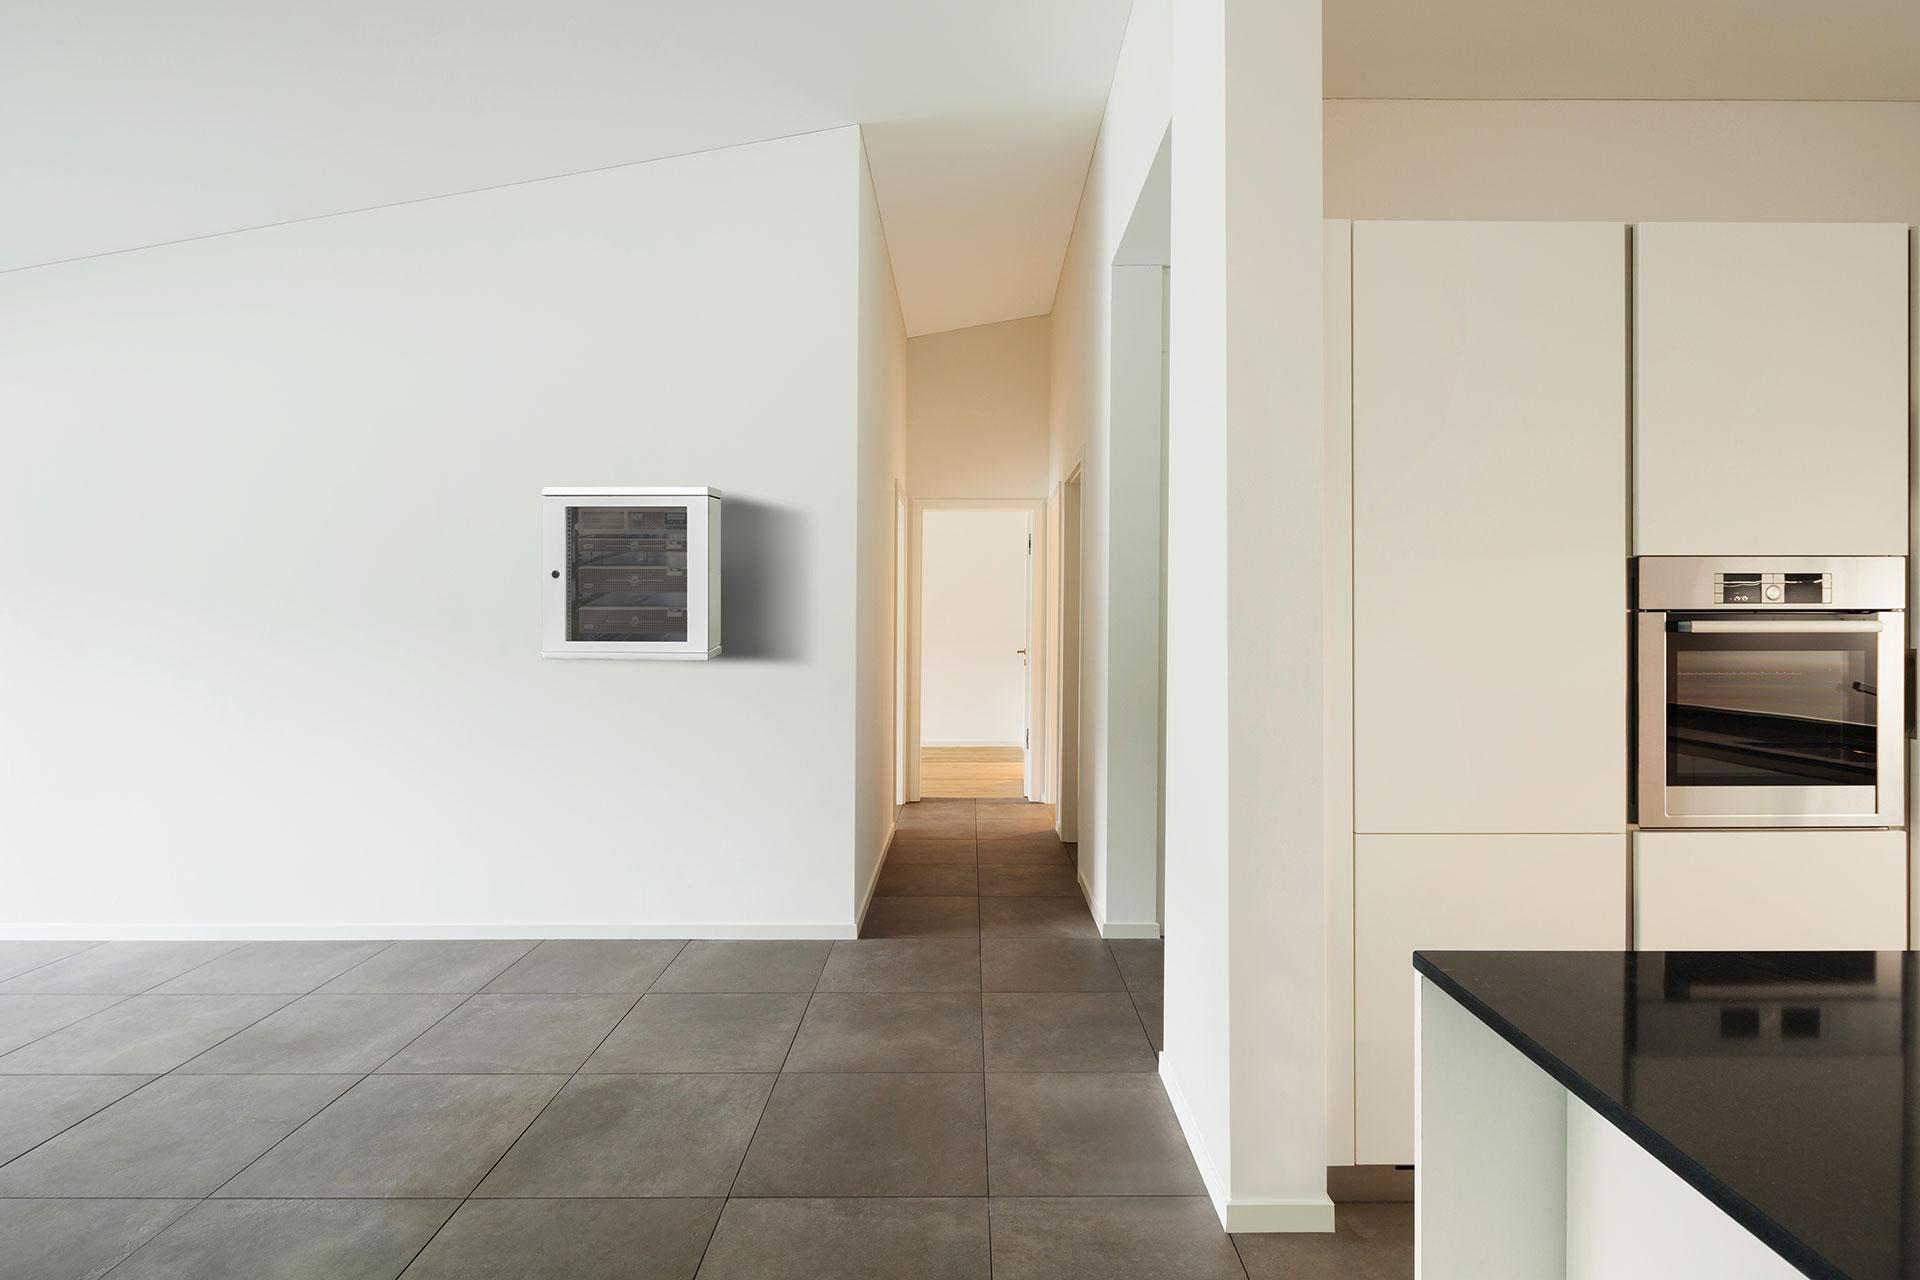 Enolgasitech armadi rack cabinet a pavimento a parete e - Armadi a parete ...